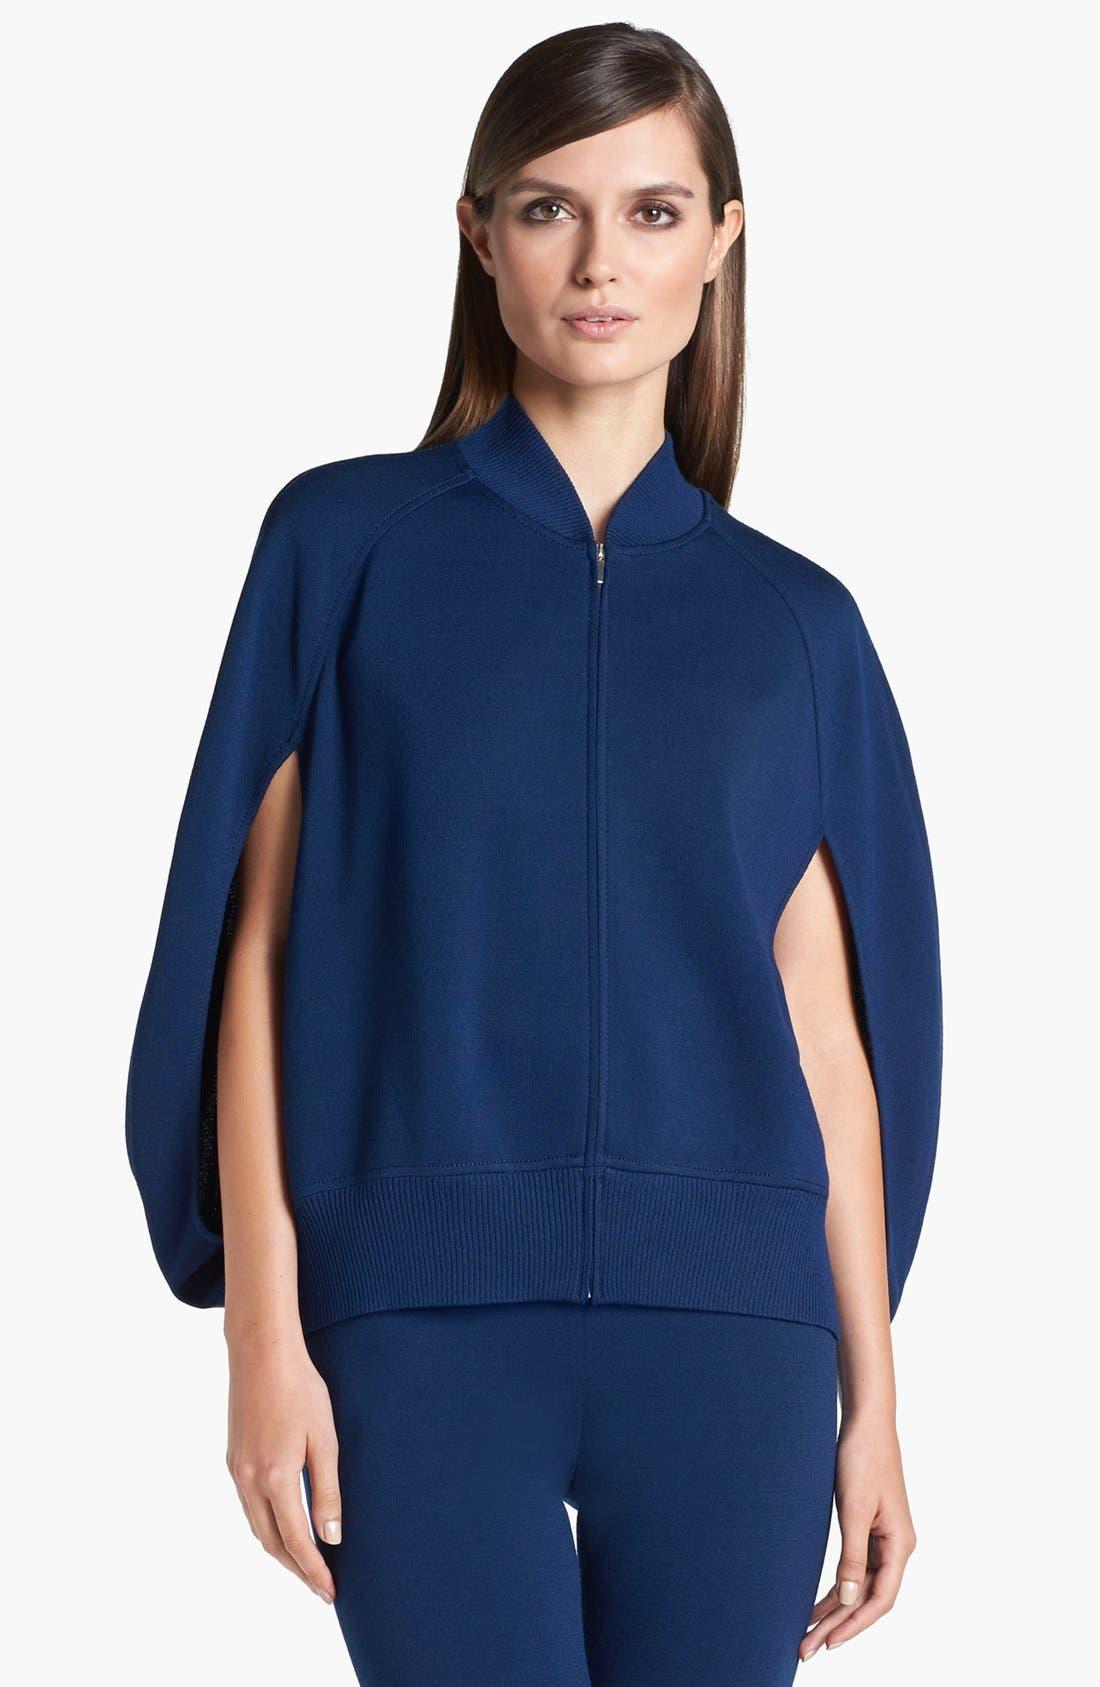 Main Image - St. John Collection Milano Knit Cape Jacket